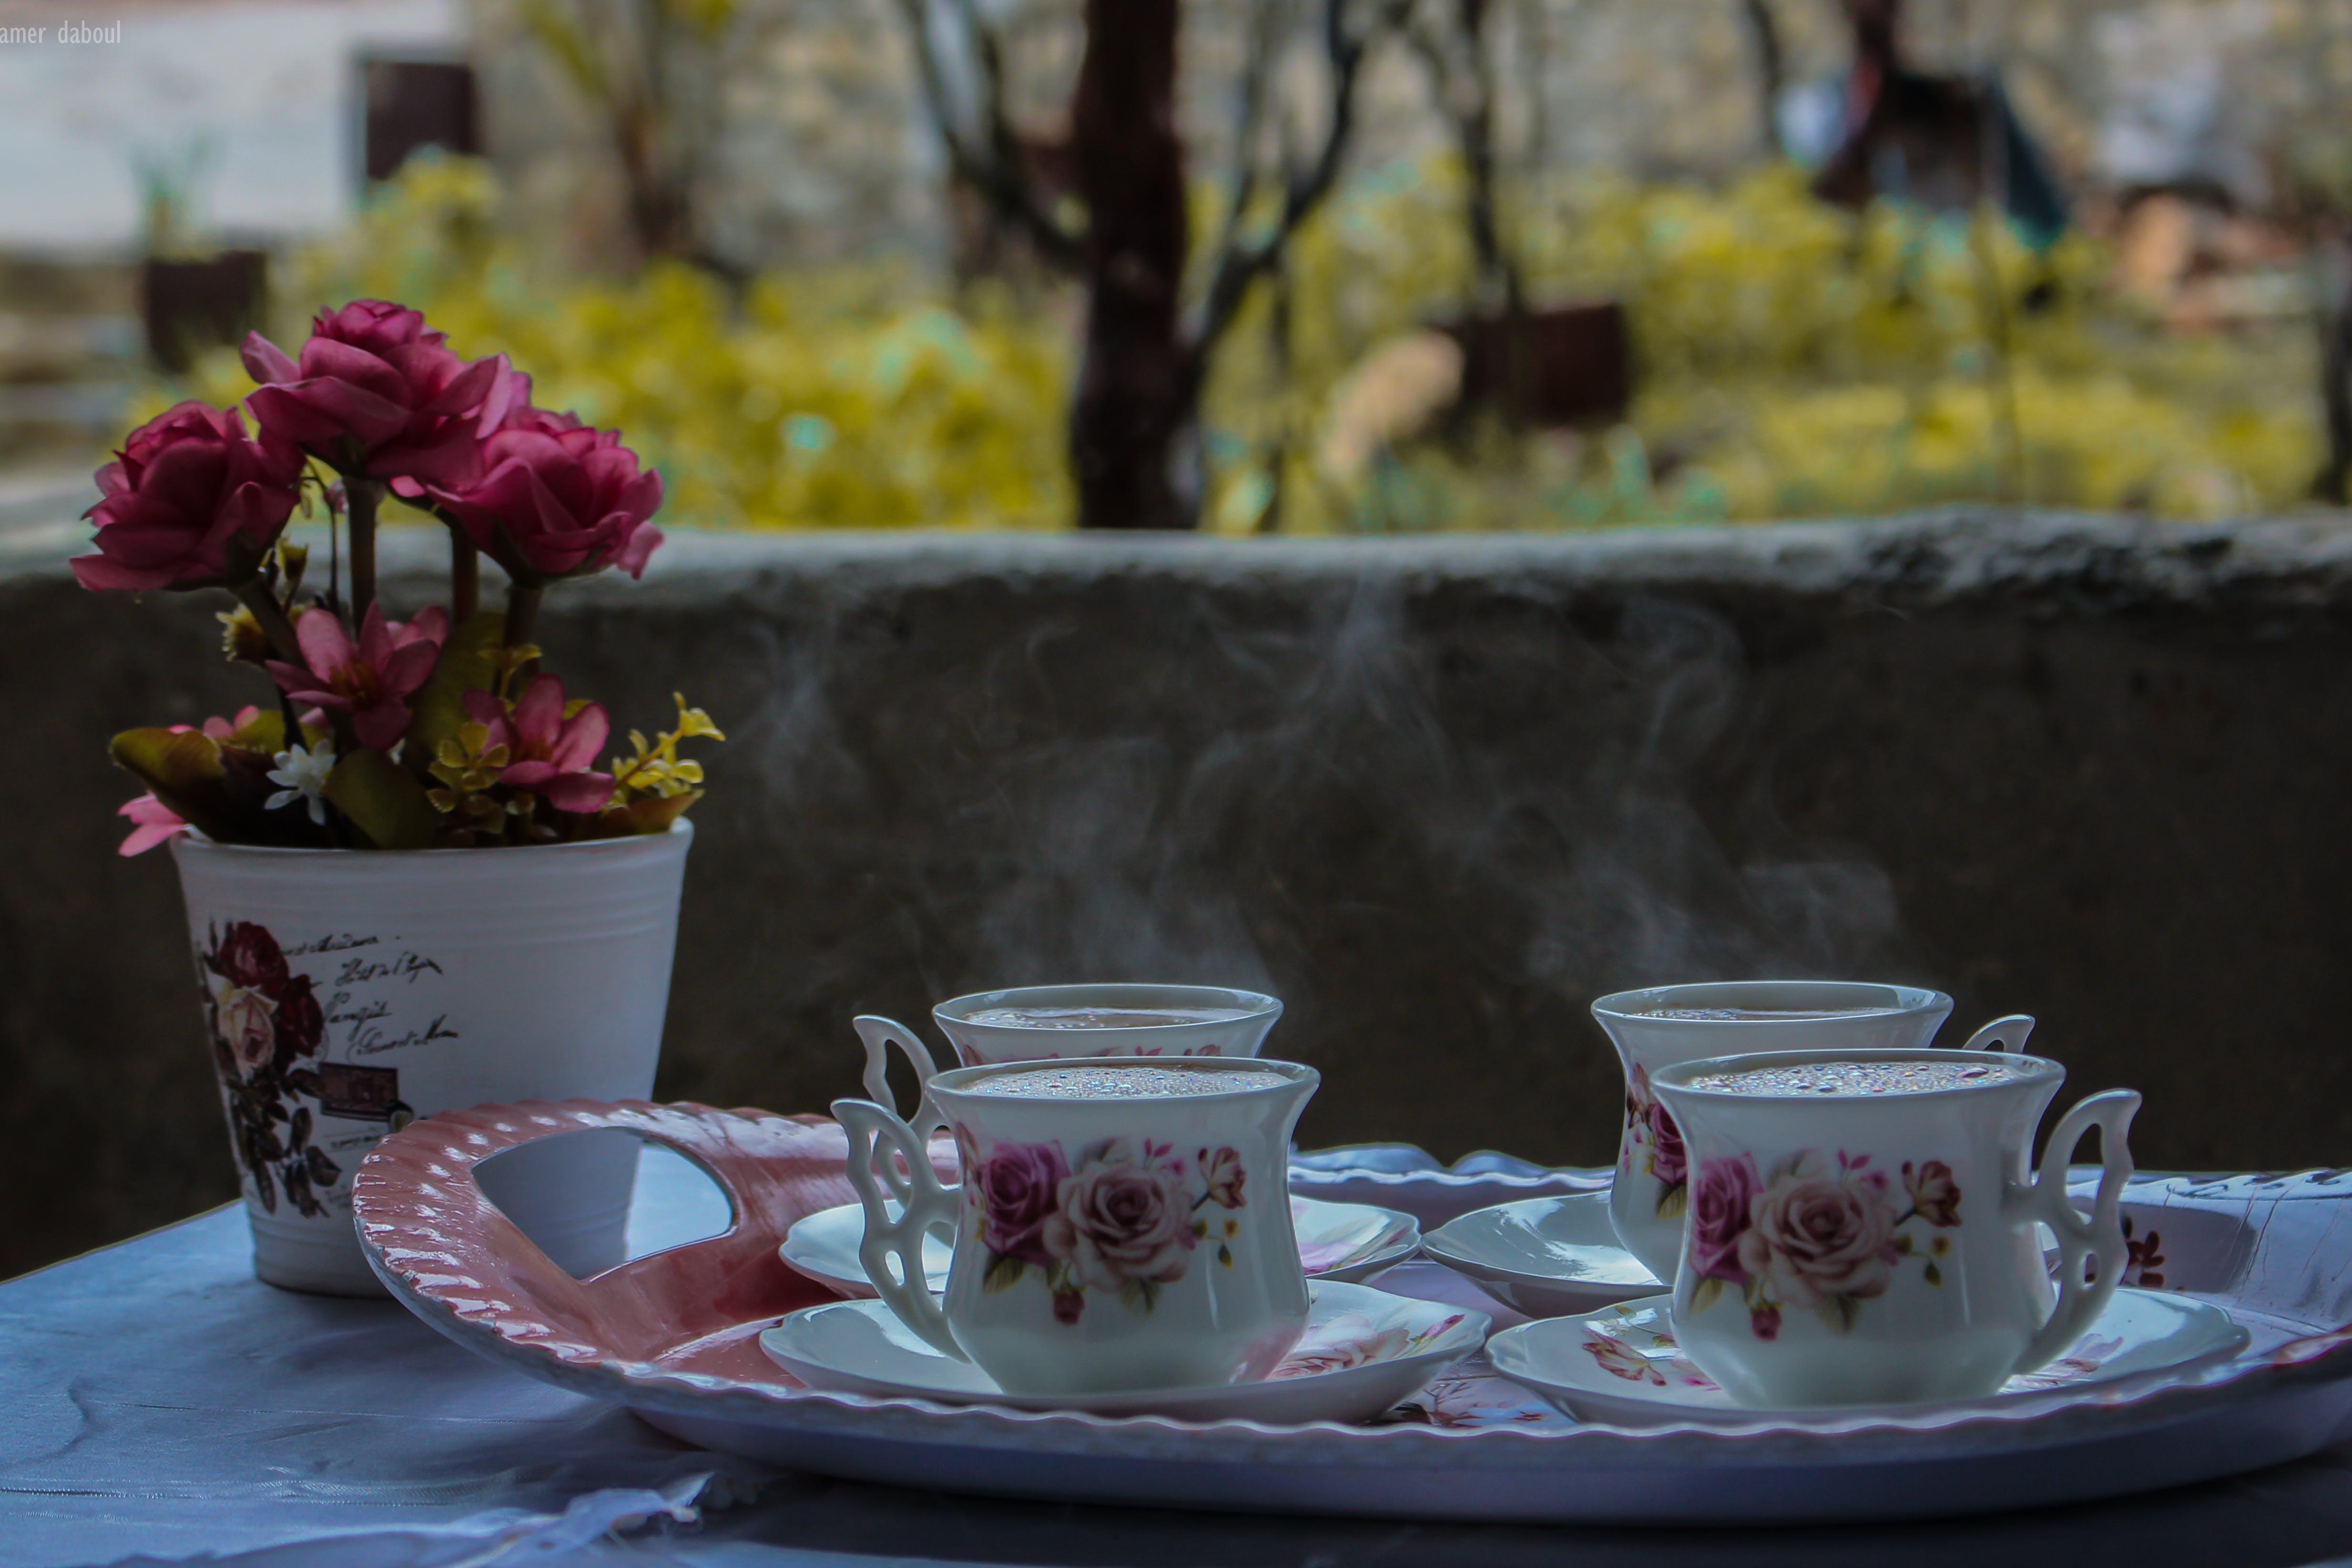 artificial flowers, beautiful flowers, beverage